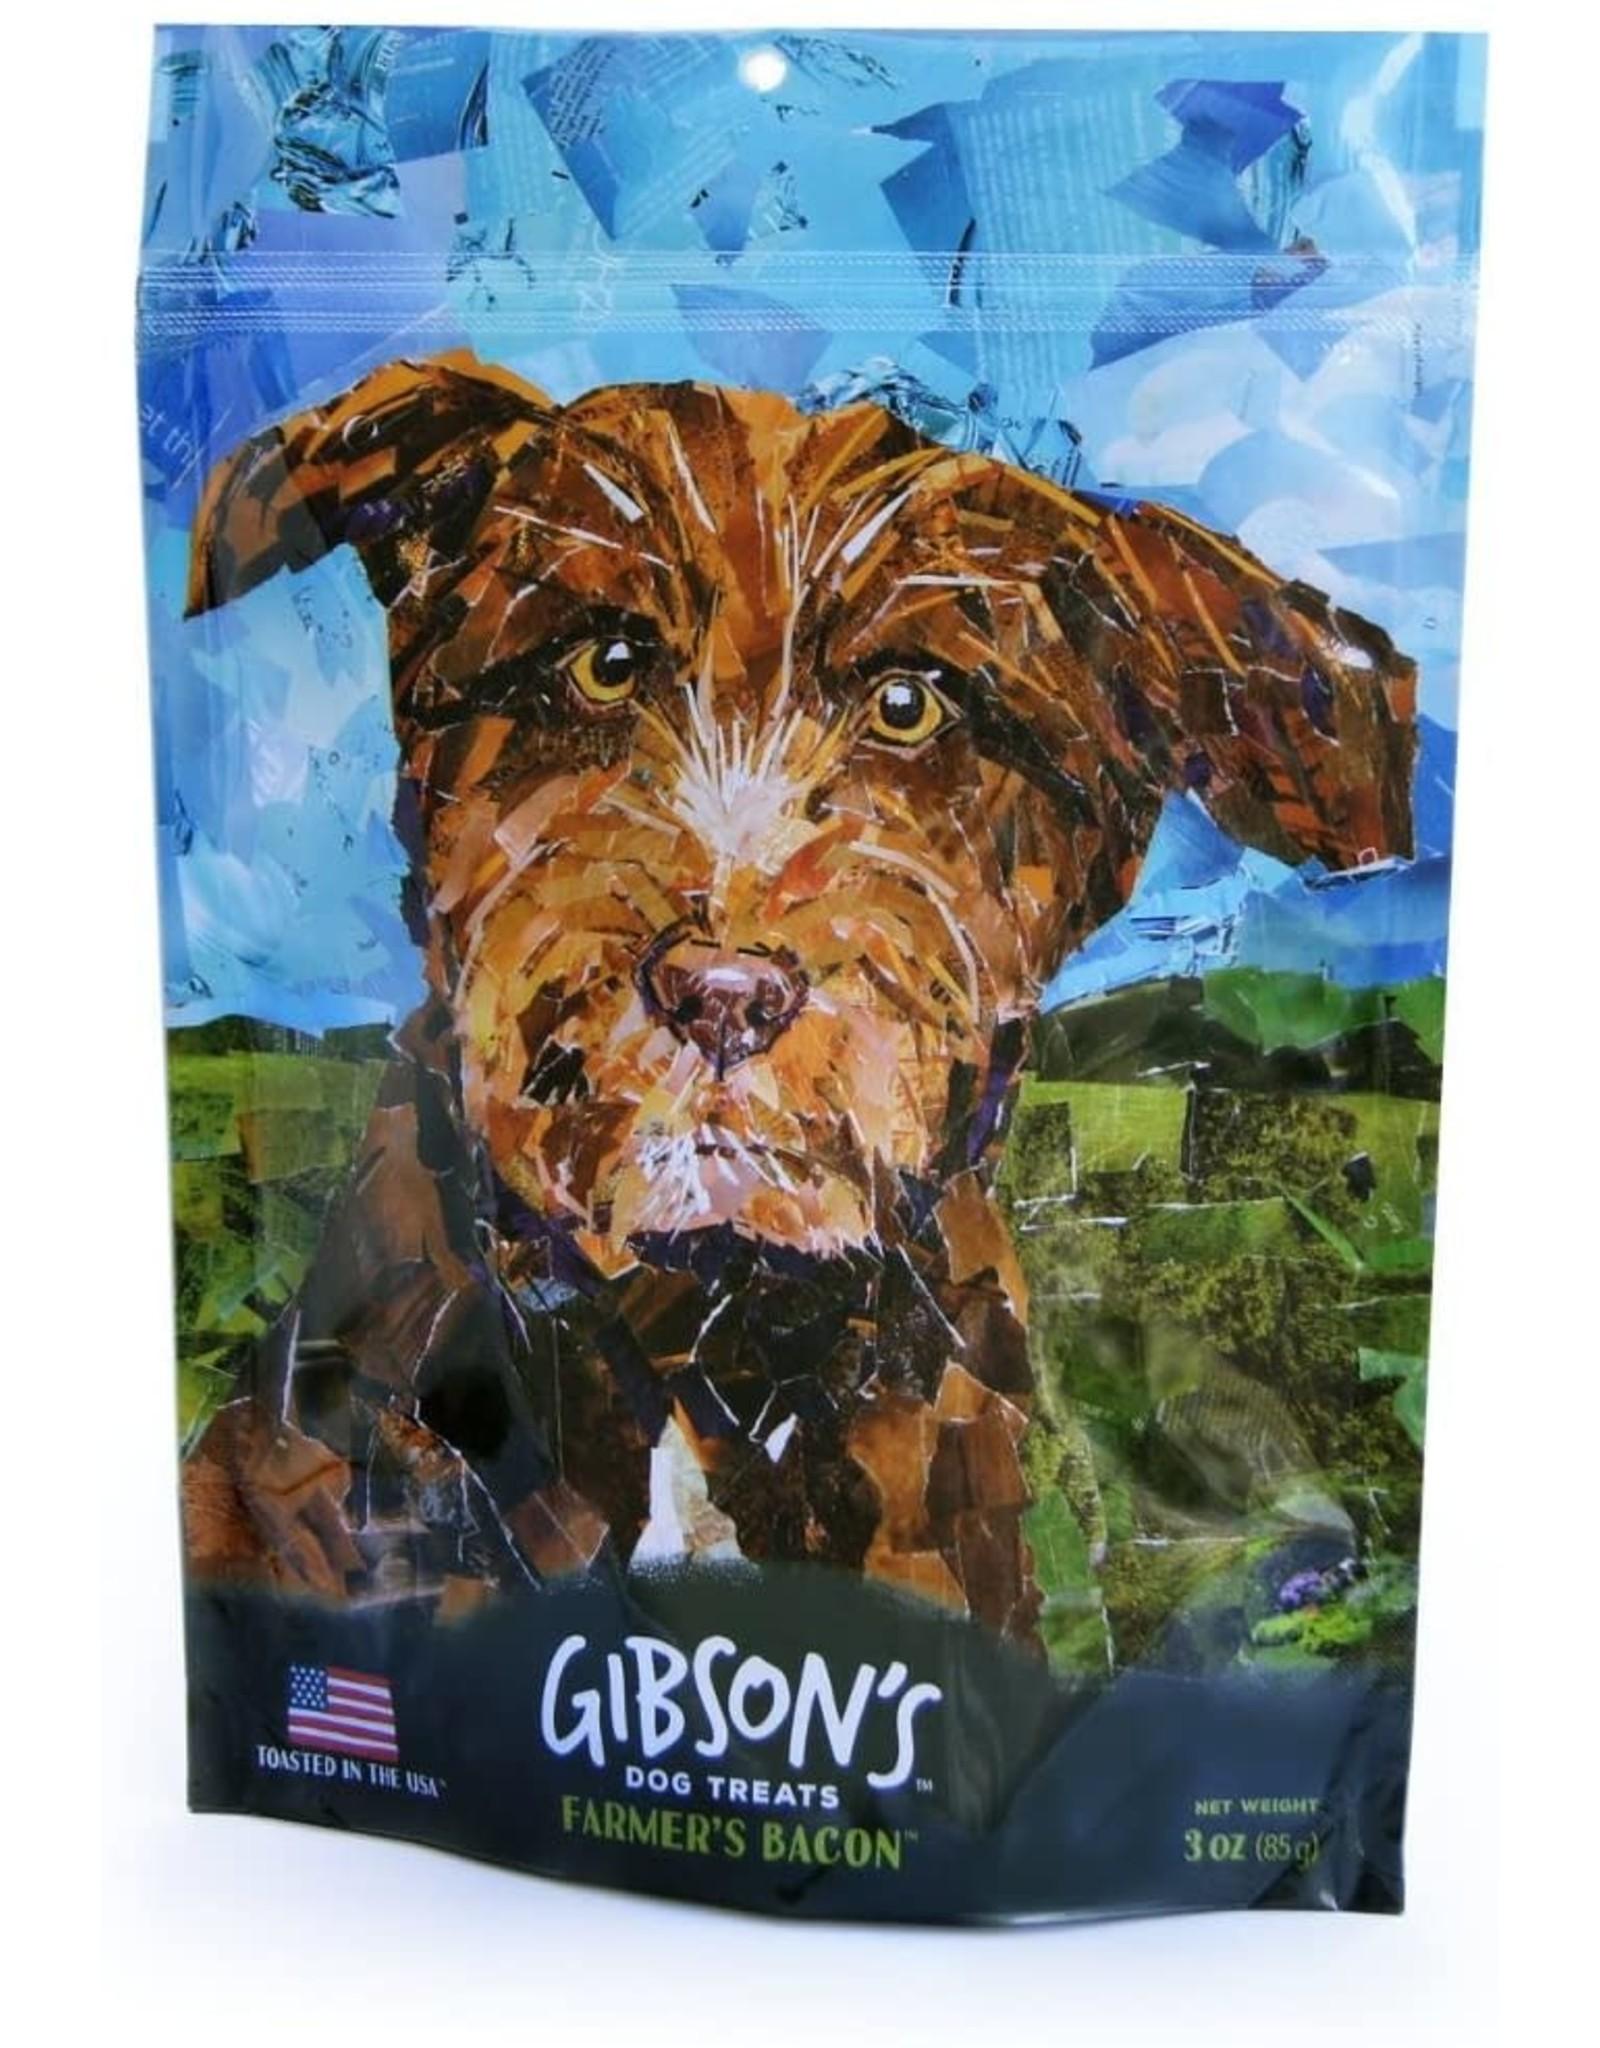 Wild Meadow Farms Gibsons Toasted: Farmers Bacon, 3oz